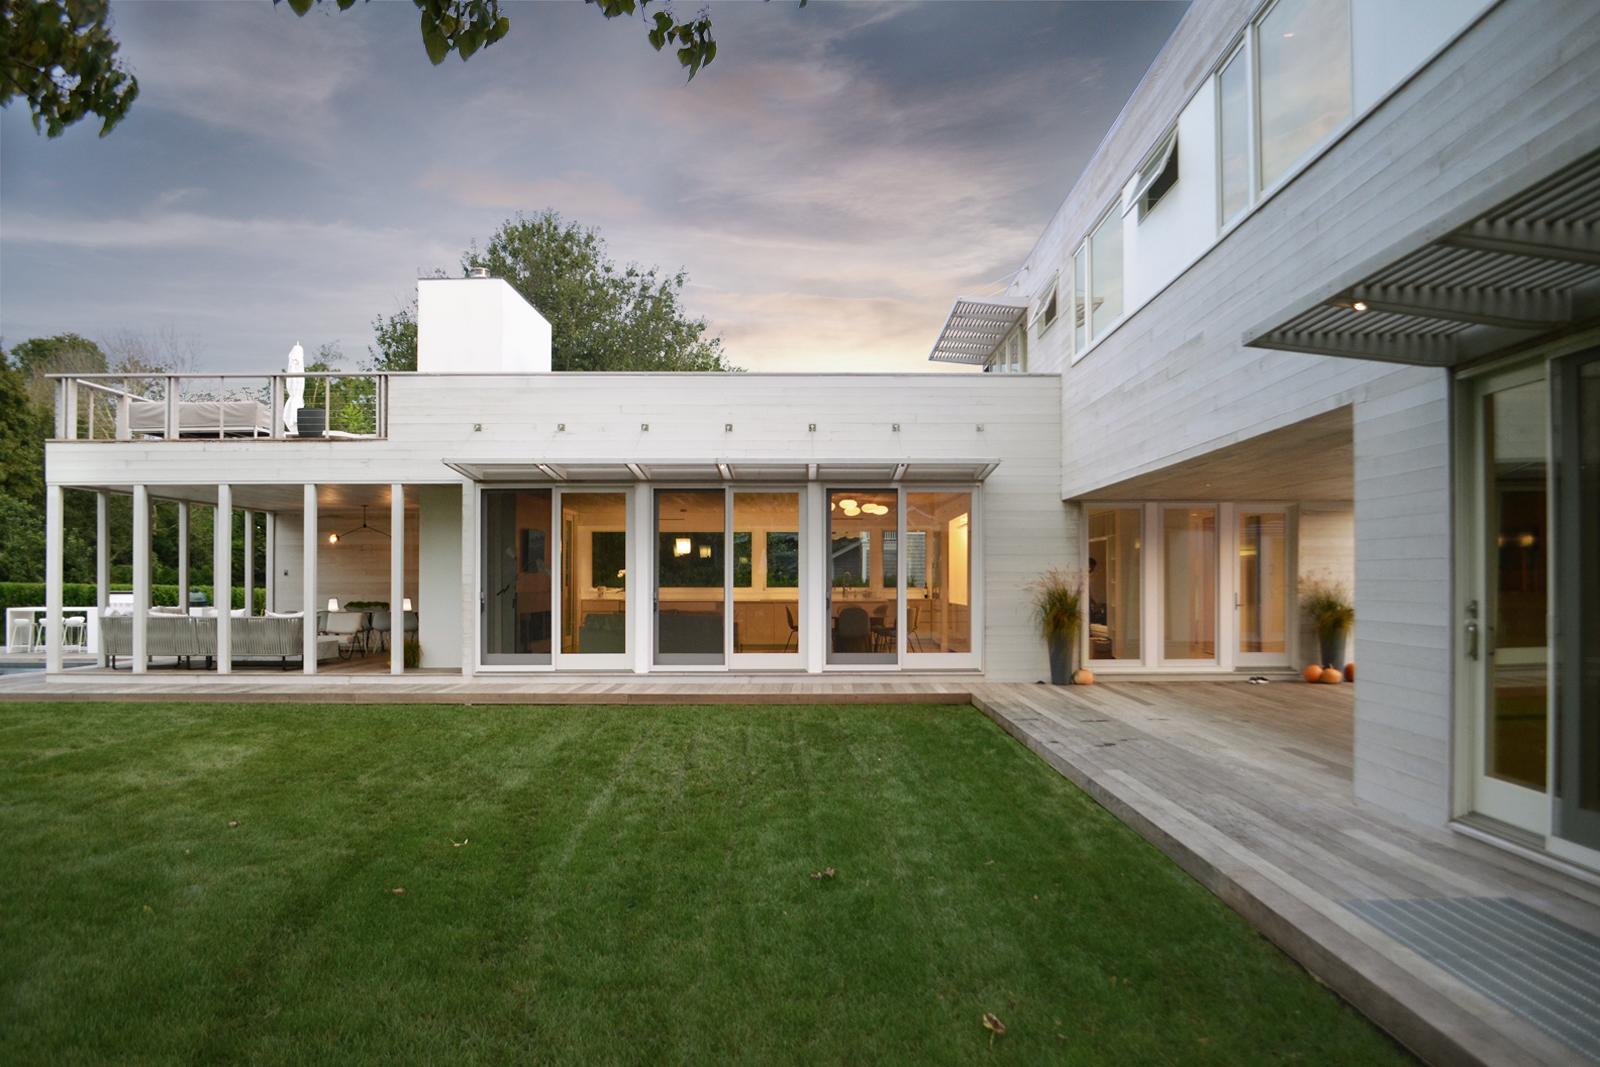 8-re4a-resolution-4-architecture-modern-modular-prefab-bridgehampton house-exterior-dusk.jpg